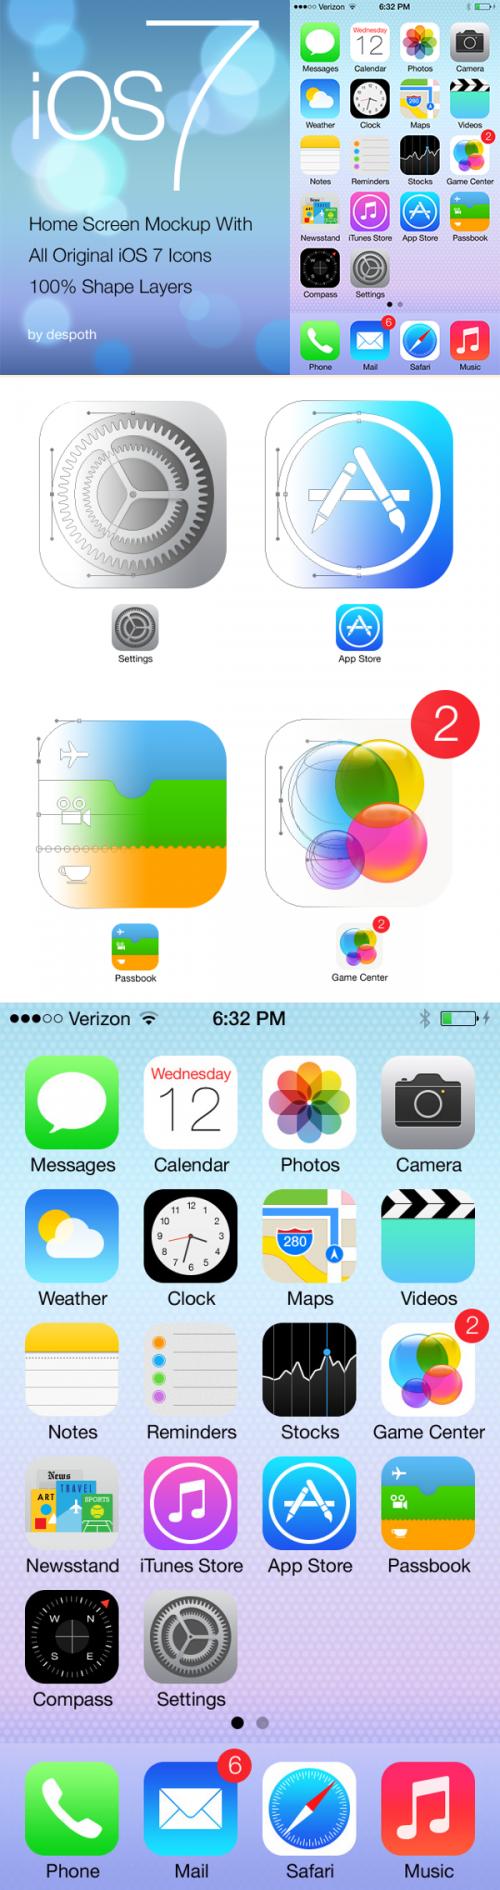 iOS 7 ホーム画面のアイコン PSD